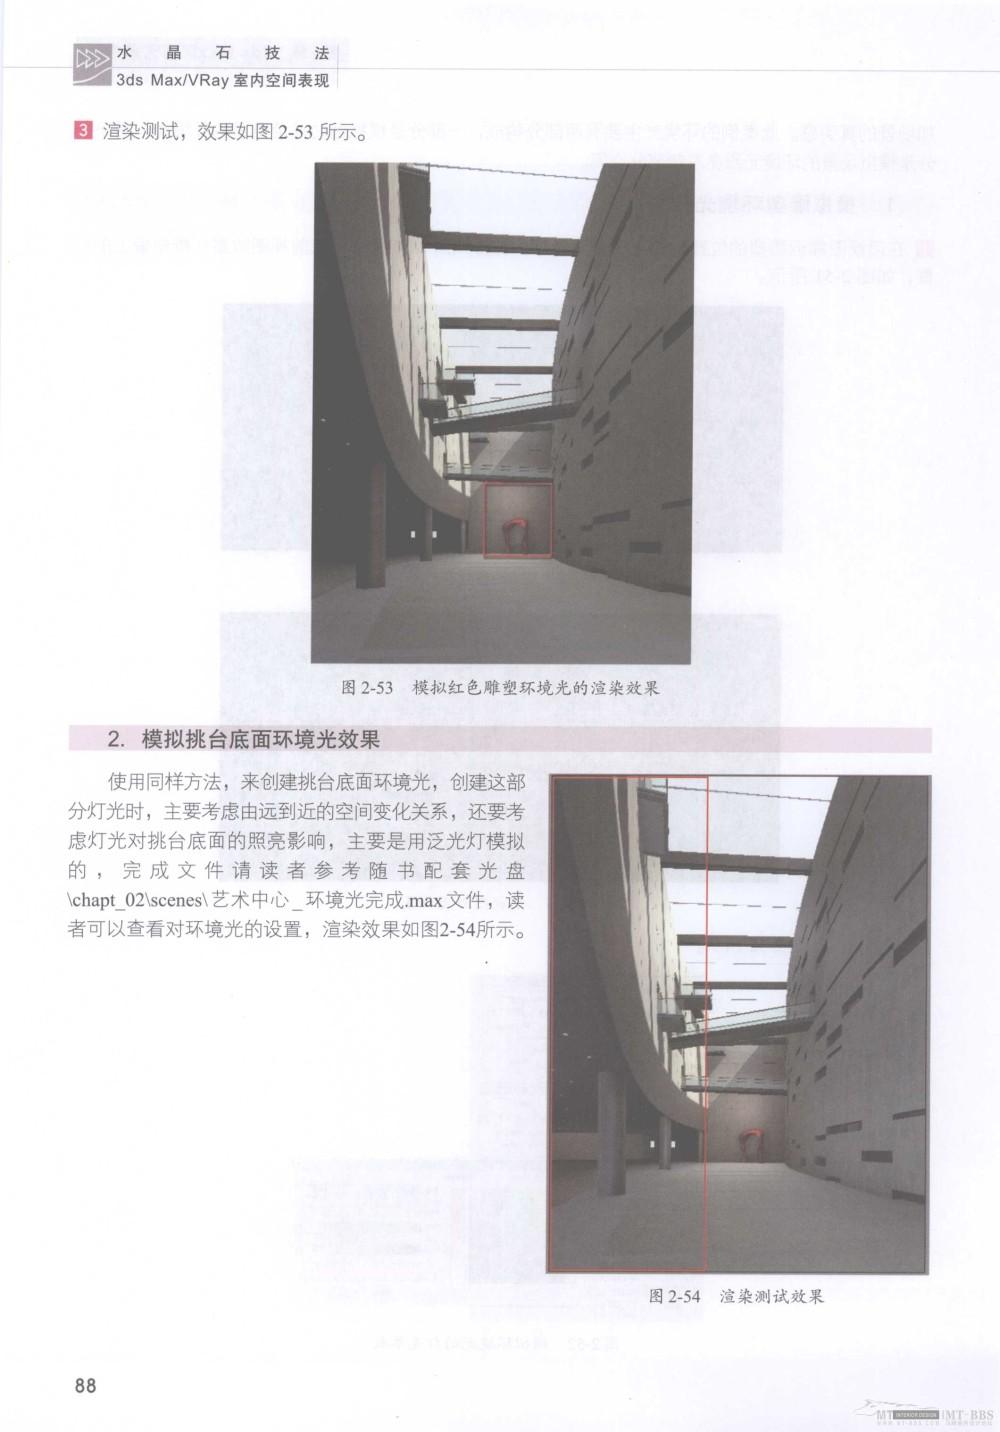 水晶石技法-3ds_Max&VRay室内空间表现_水晶石技法-3ds_Max&VRay室内空间表现_页面_094.jpg